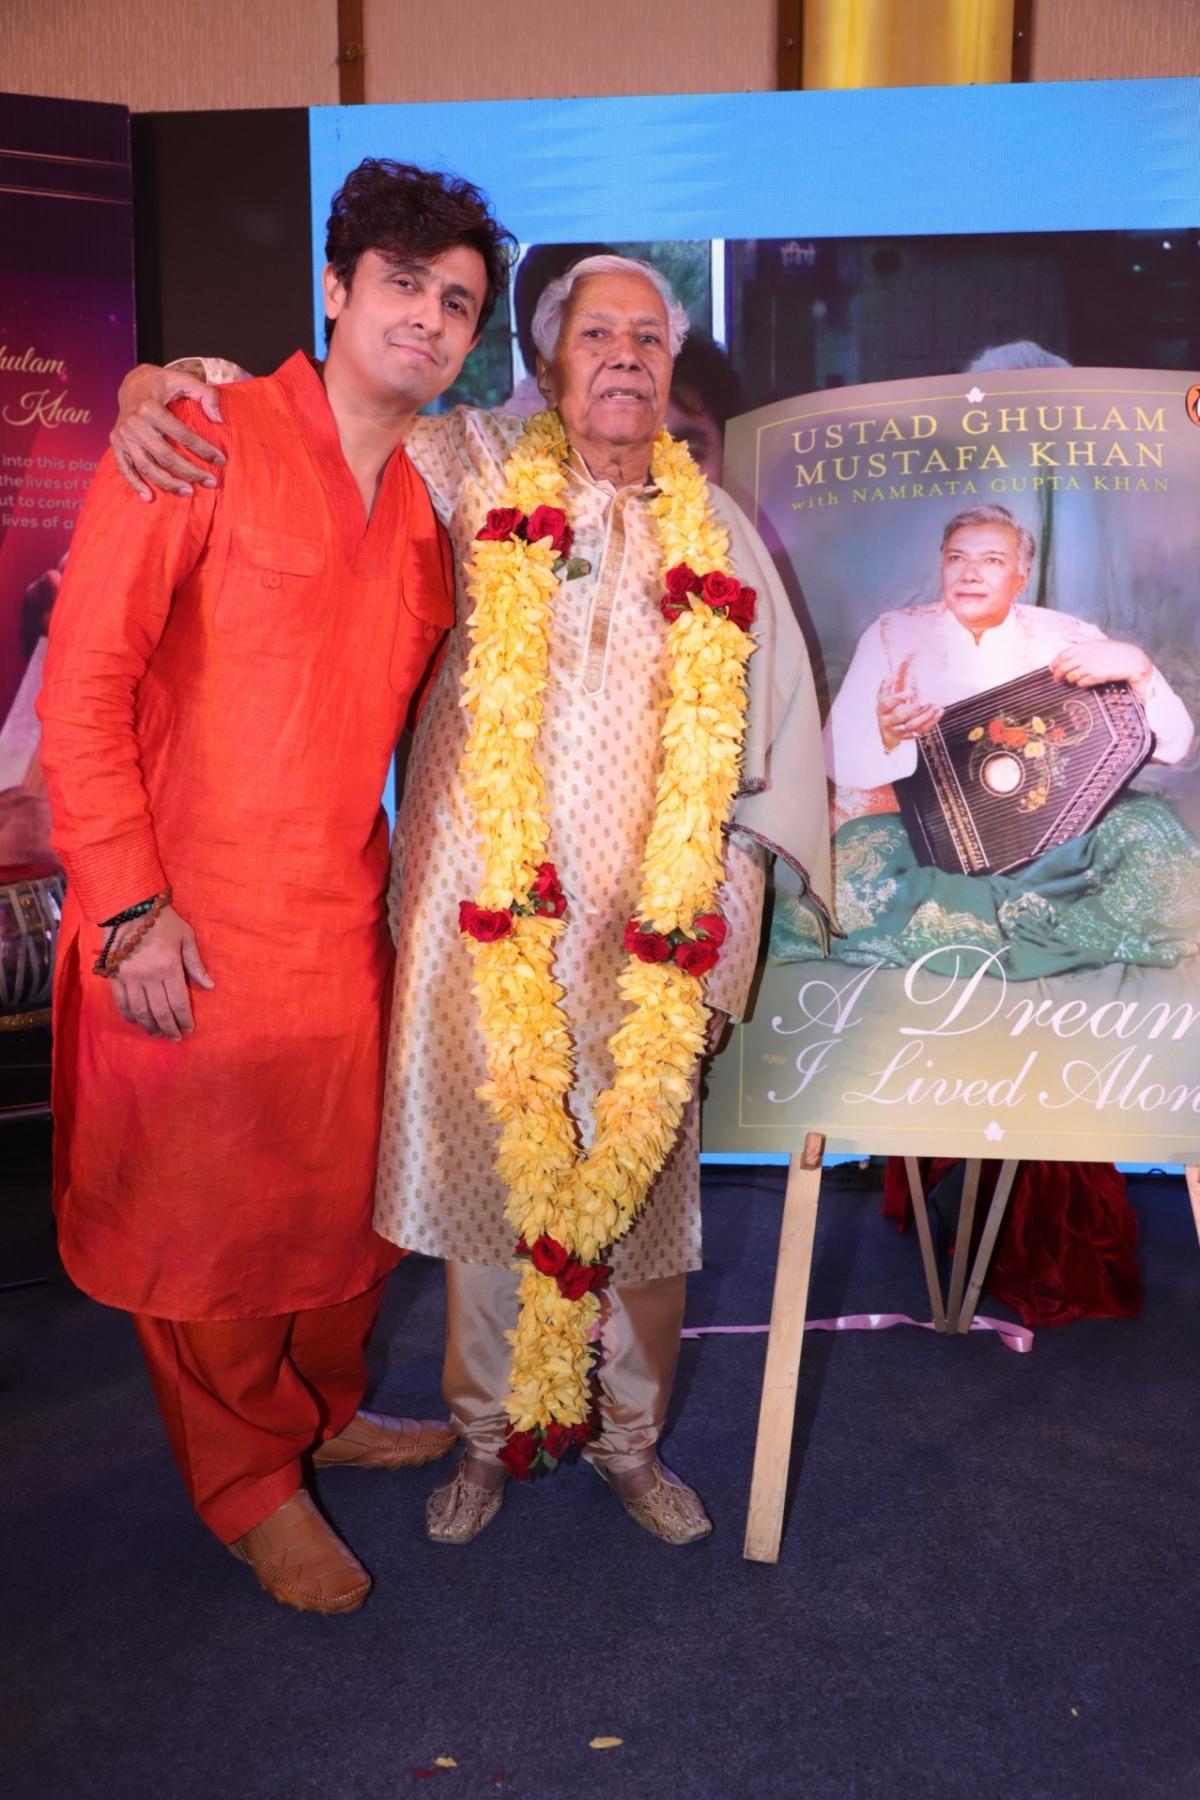 1 Sonu Nigam with his Guru Ustad Ghulam Mustafa Khan.JPG